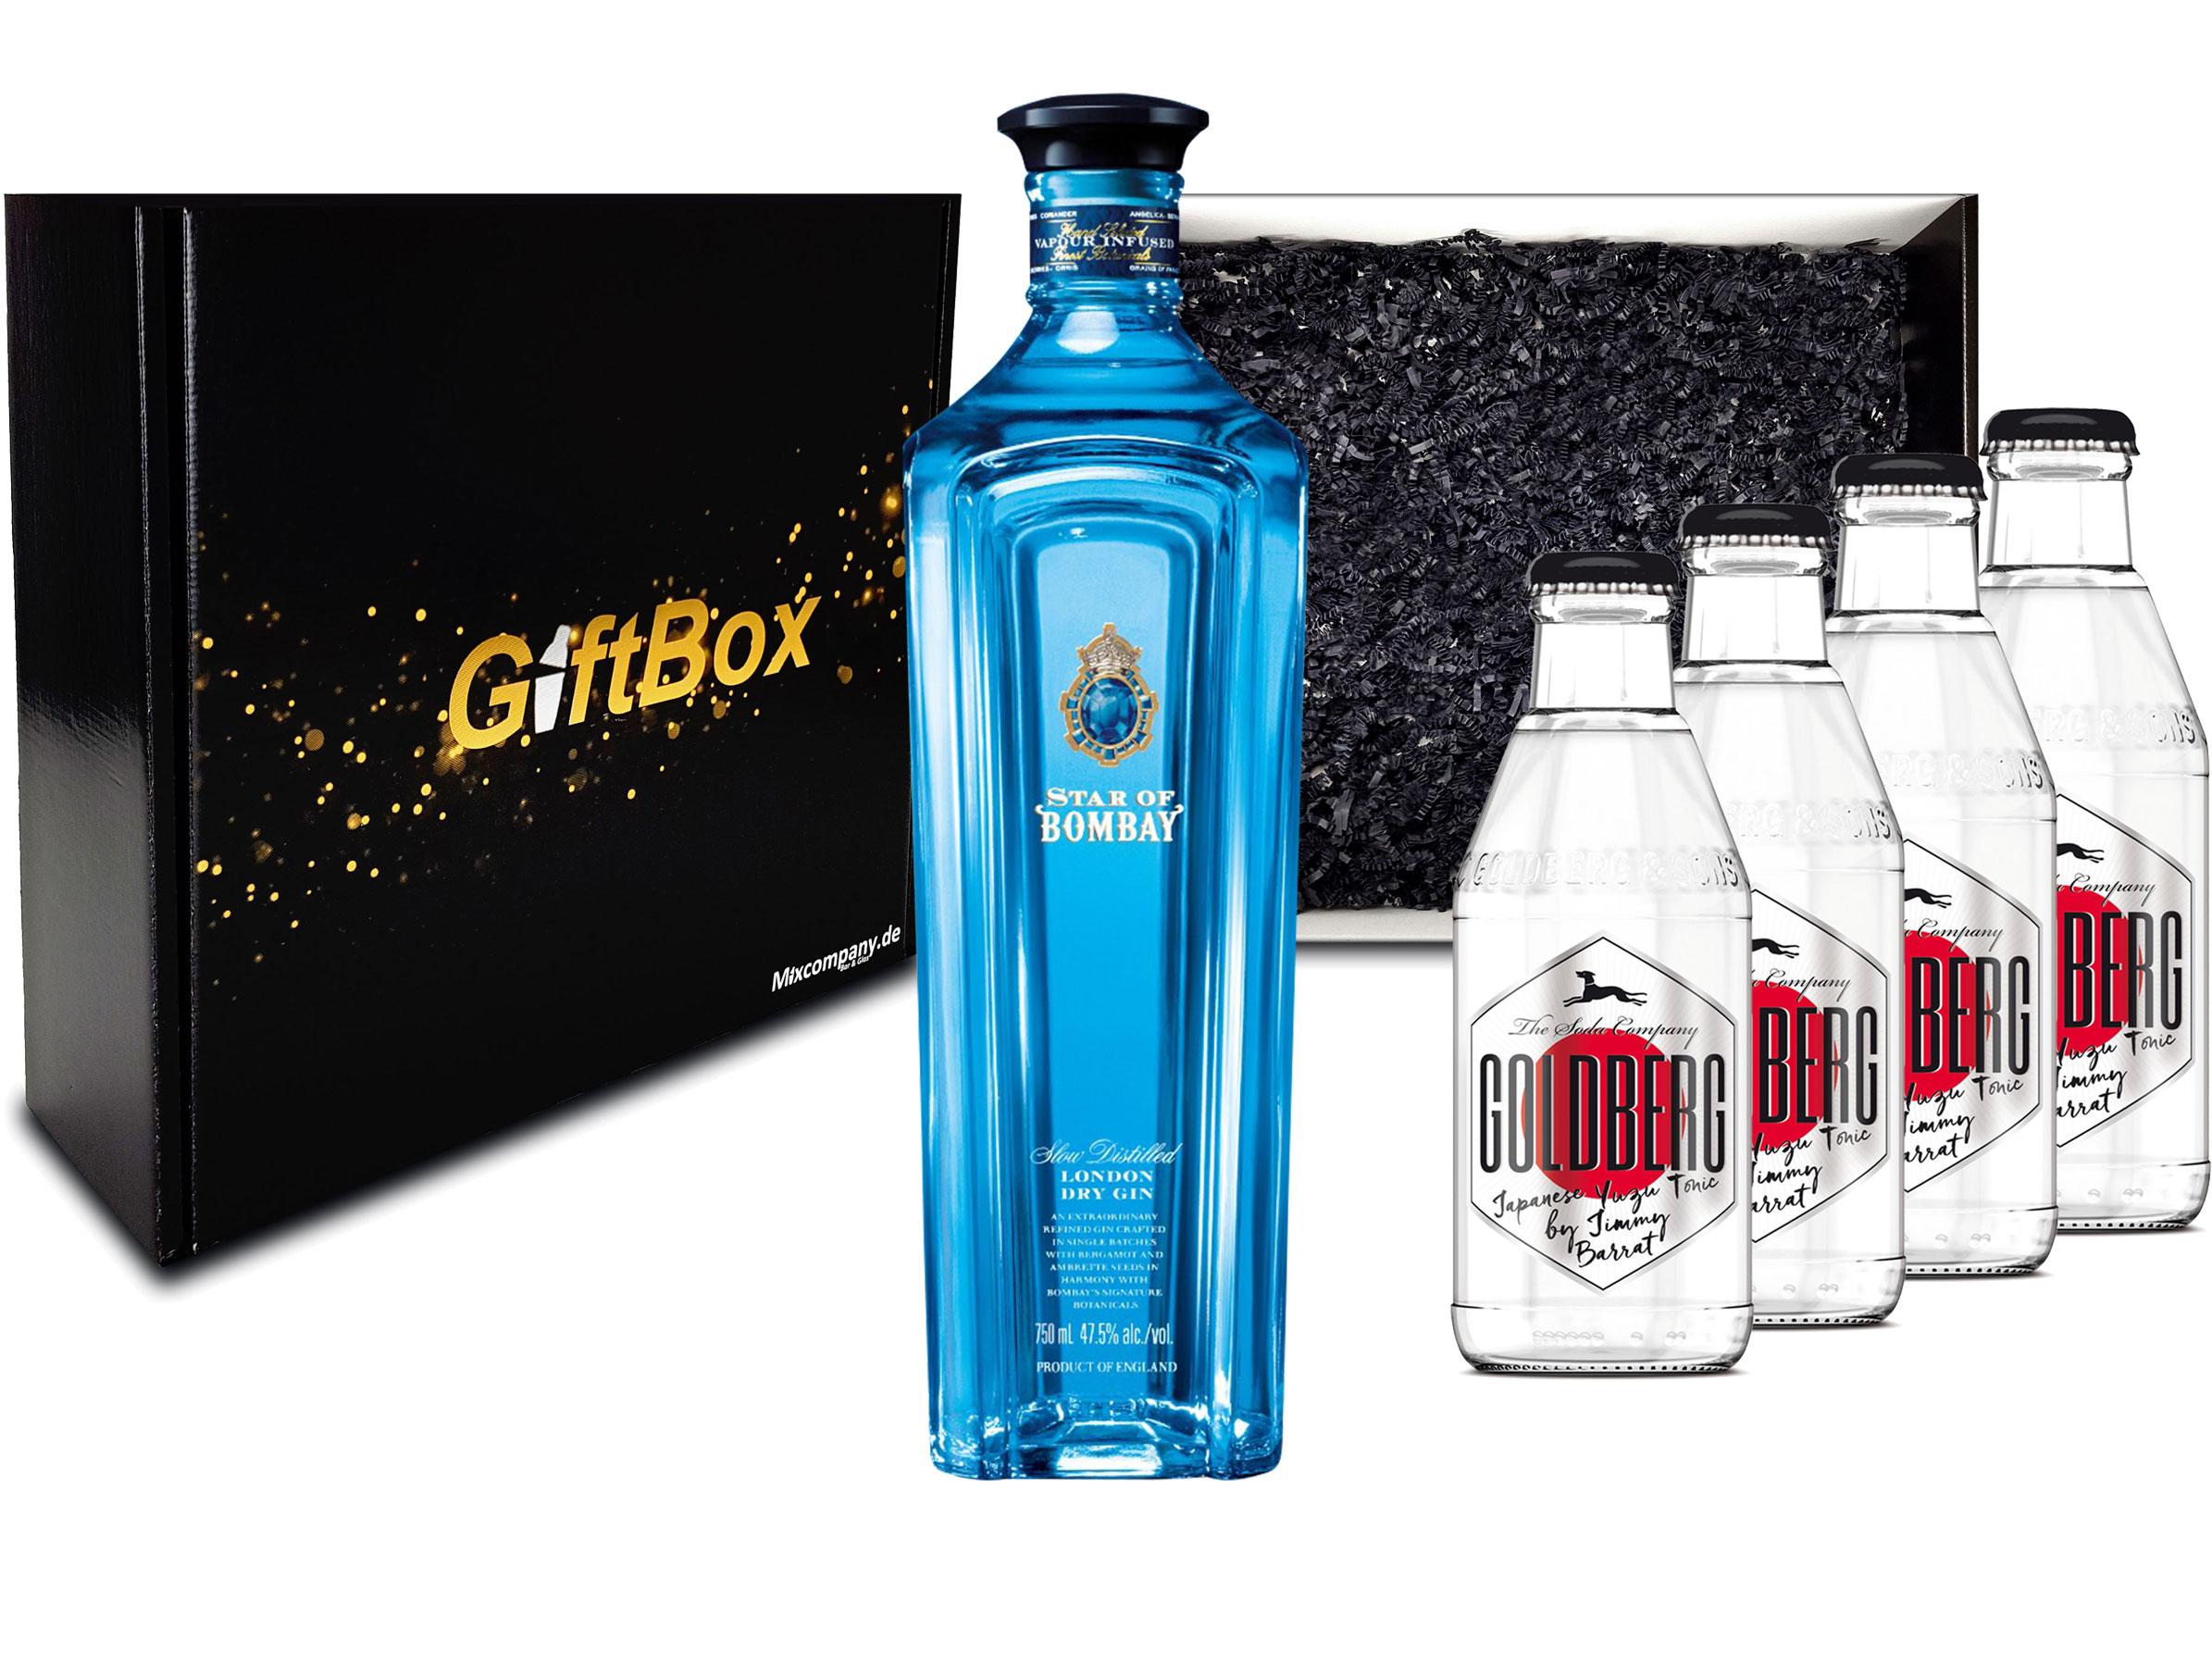 Gin Tonic Set Giftbox Geschenkset - Star of Bombay Slow Distilled London Dry Gin 0,7l (47,5% Vol) + 4x Goldberg Japanese Yuzu Tonic Water 200ml inkl. Pfand MEHRWEG -[Enthält Sulfite]